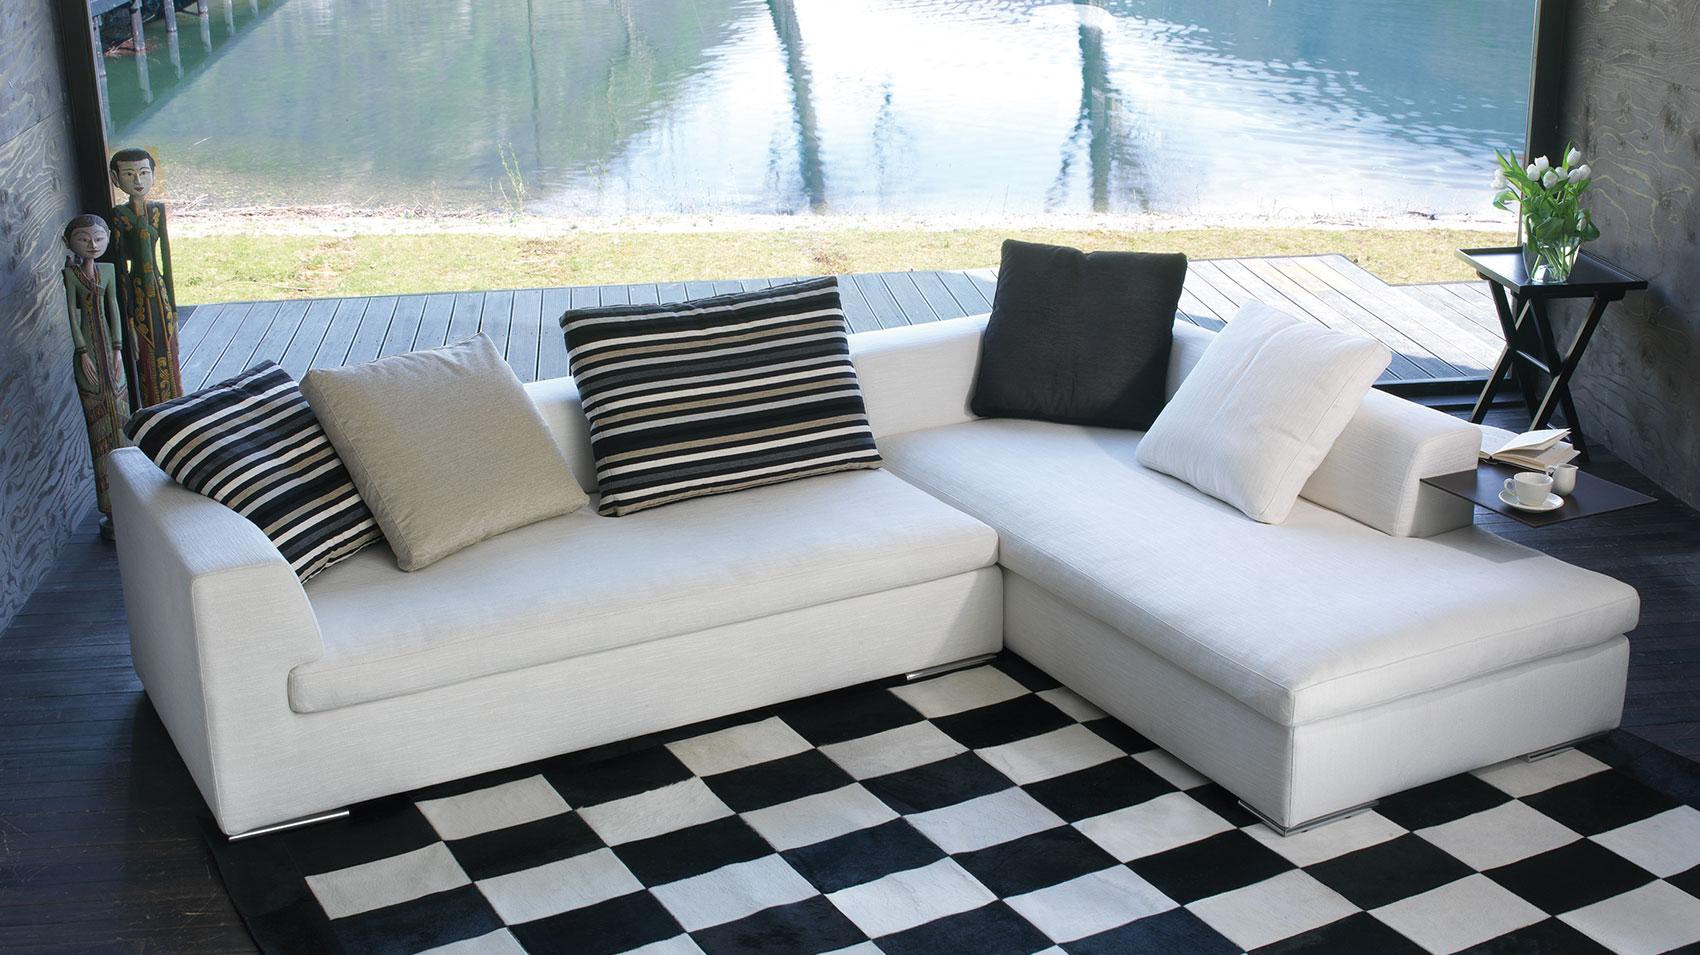 Newformsdesign modern sofa naples